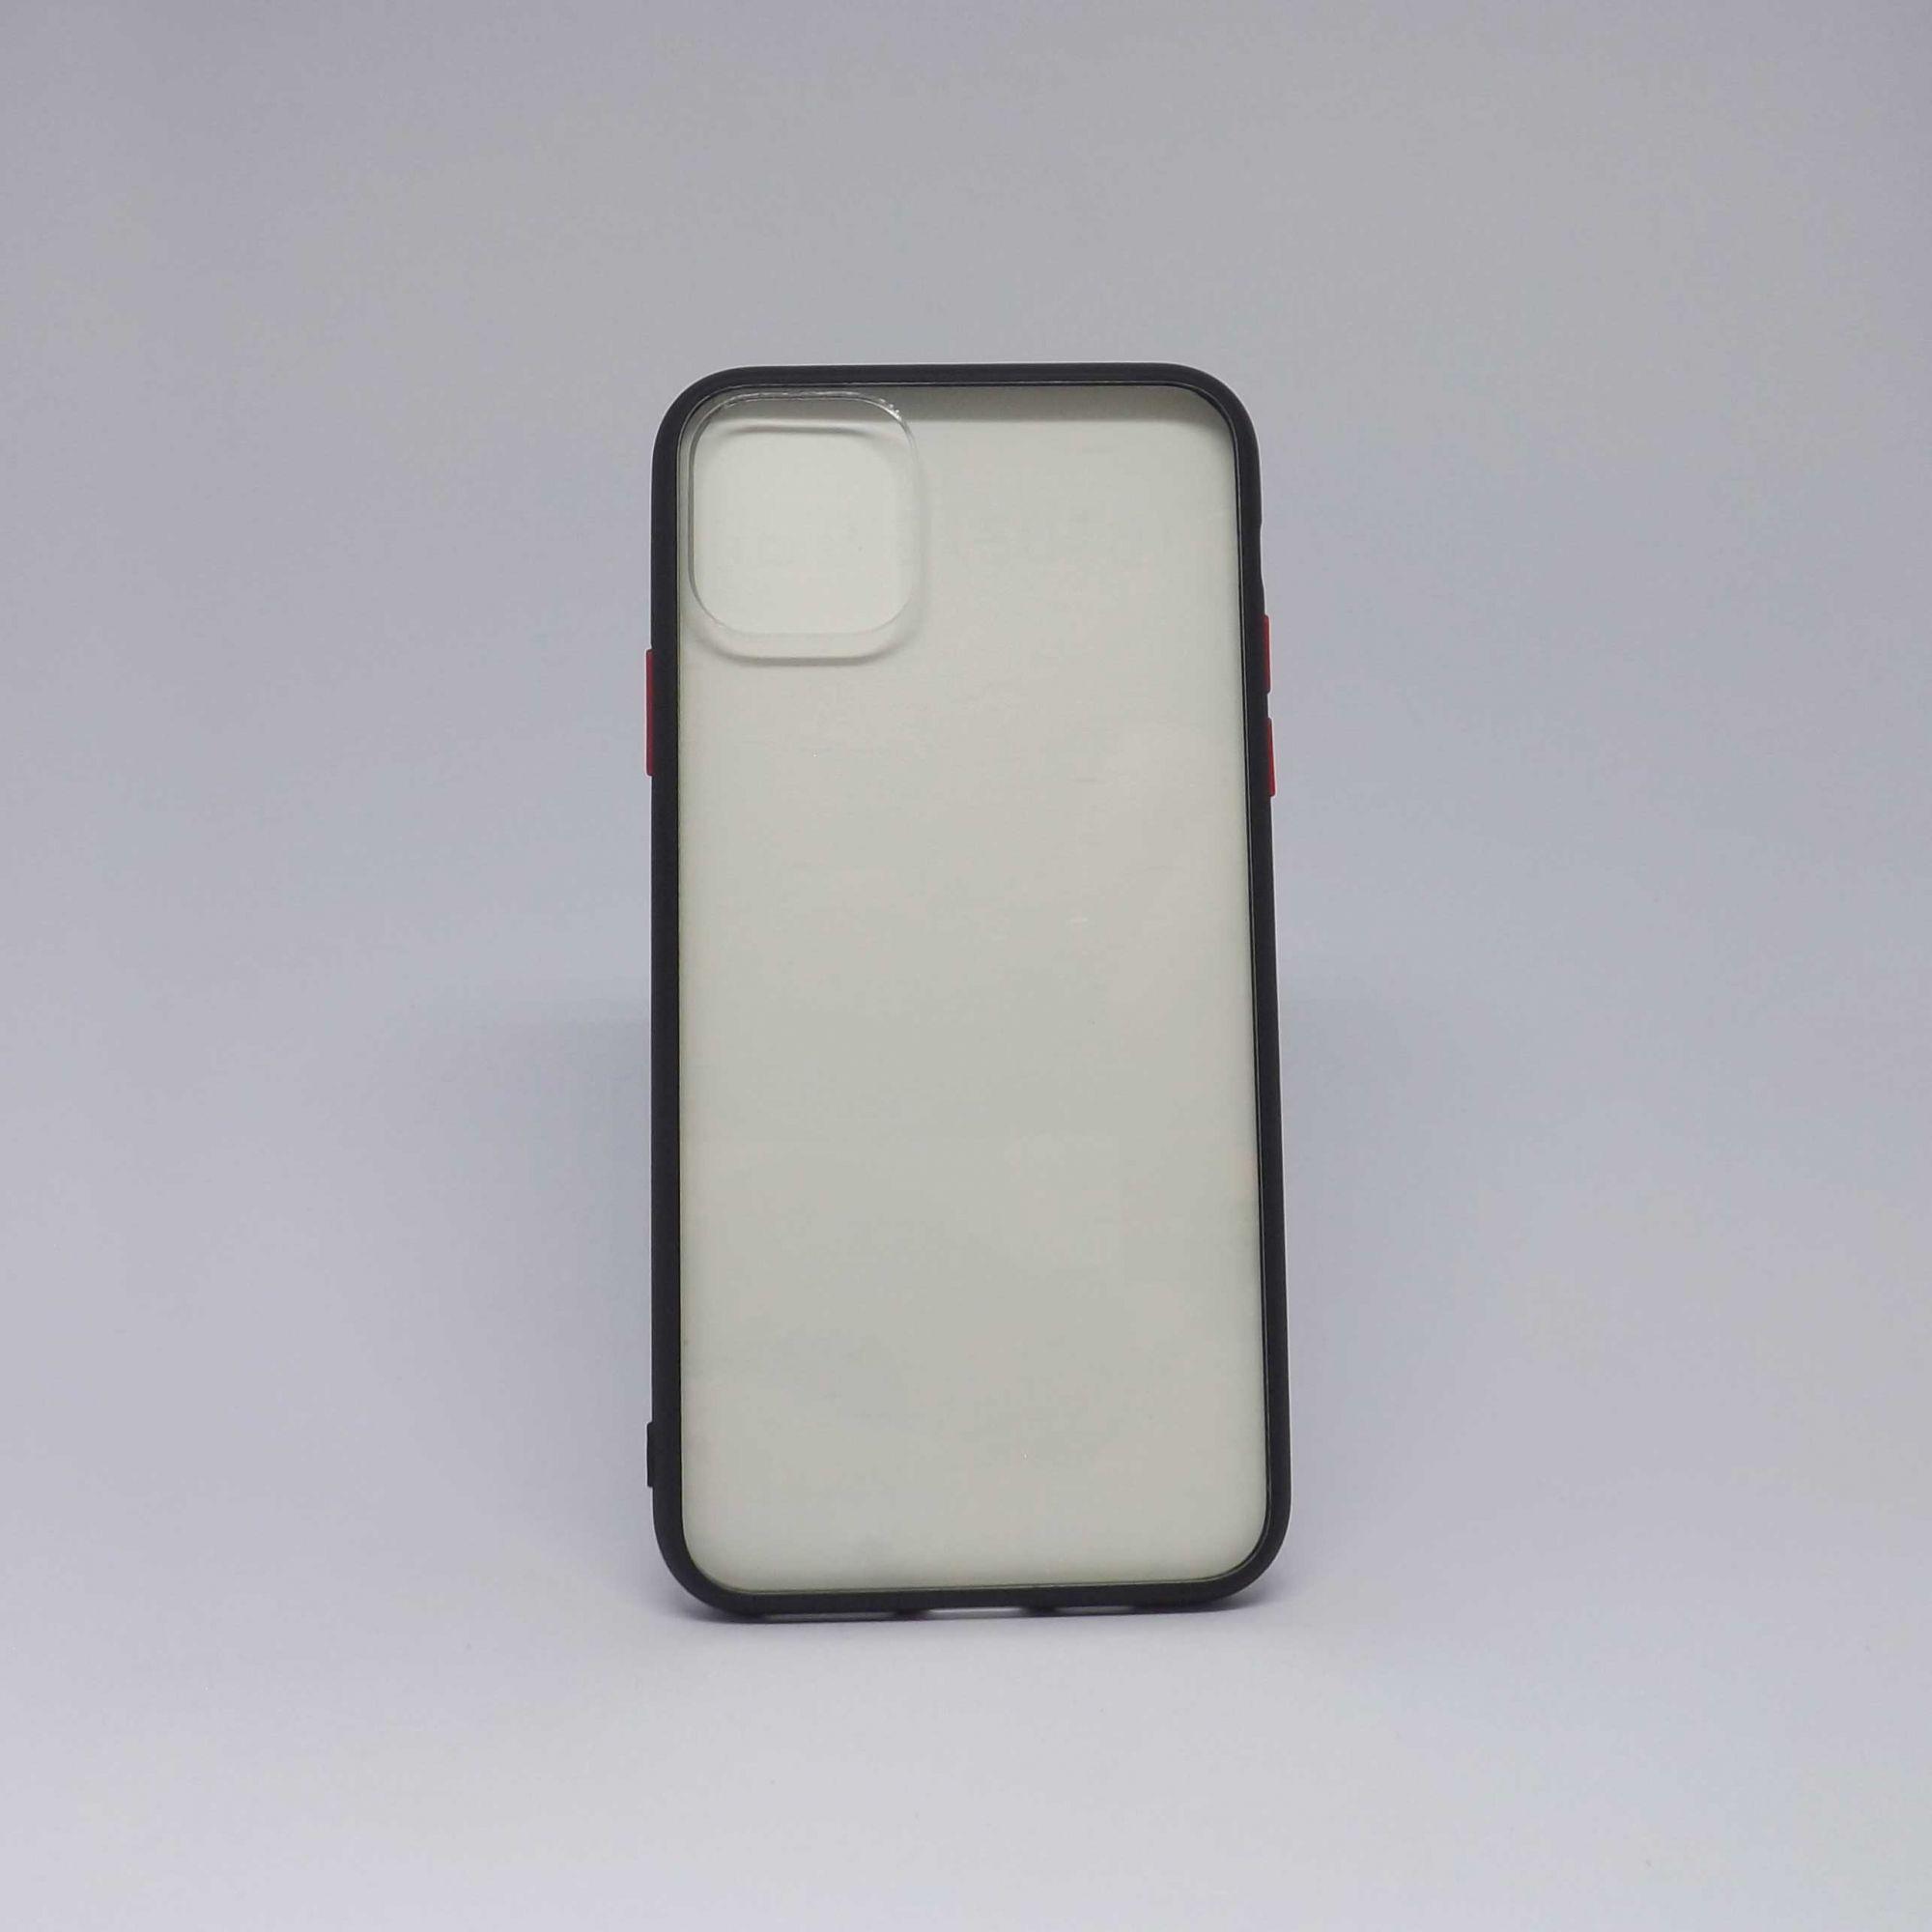 Capa iPhone 11 Pro Max Transparente com Borda Colorida